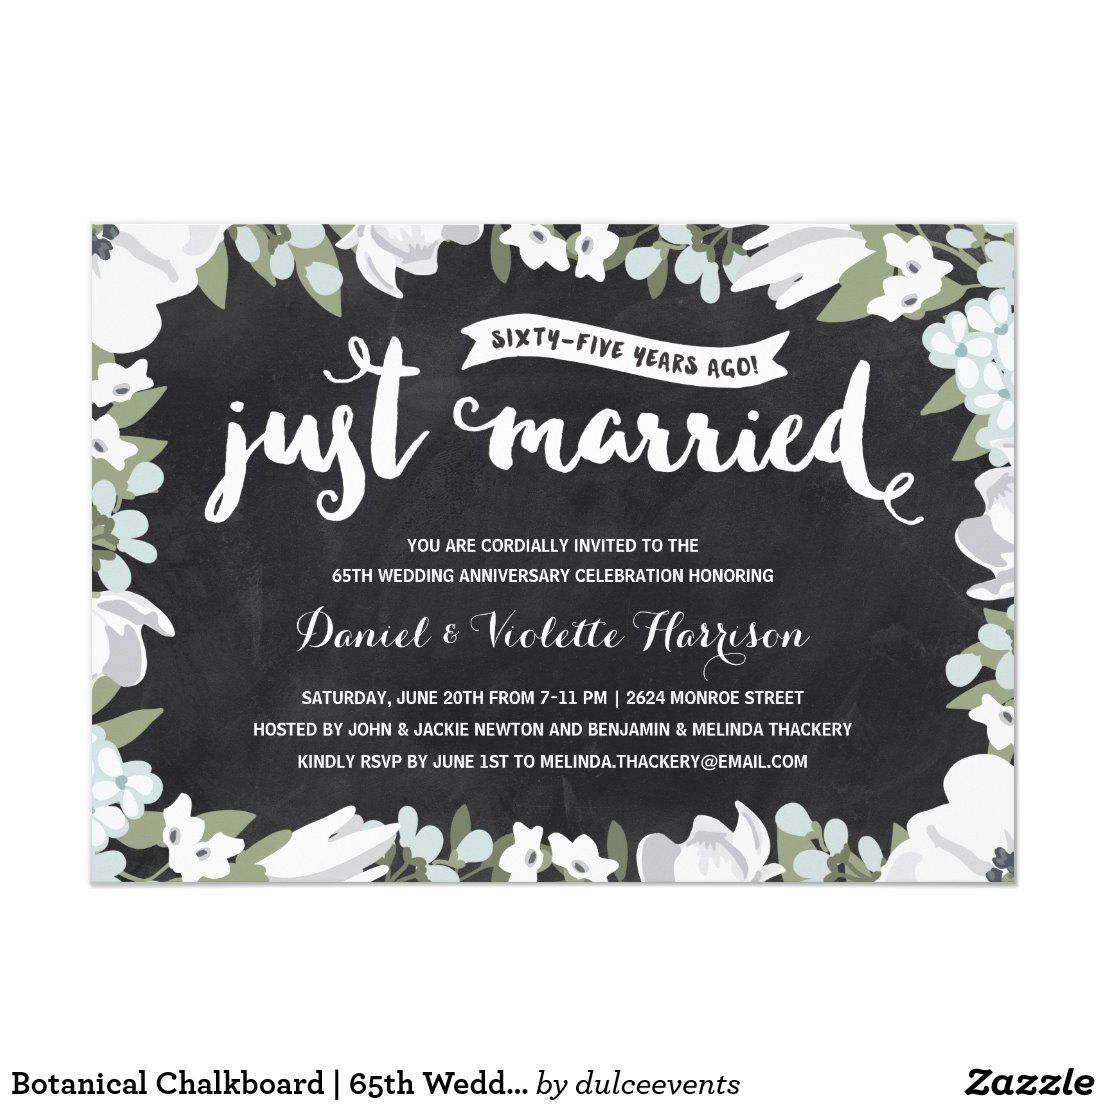 Botanical Chalkboard 65th Wedding Anniversary Invitation